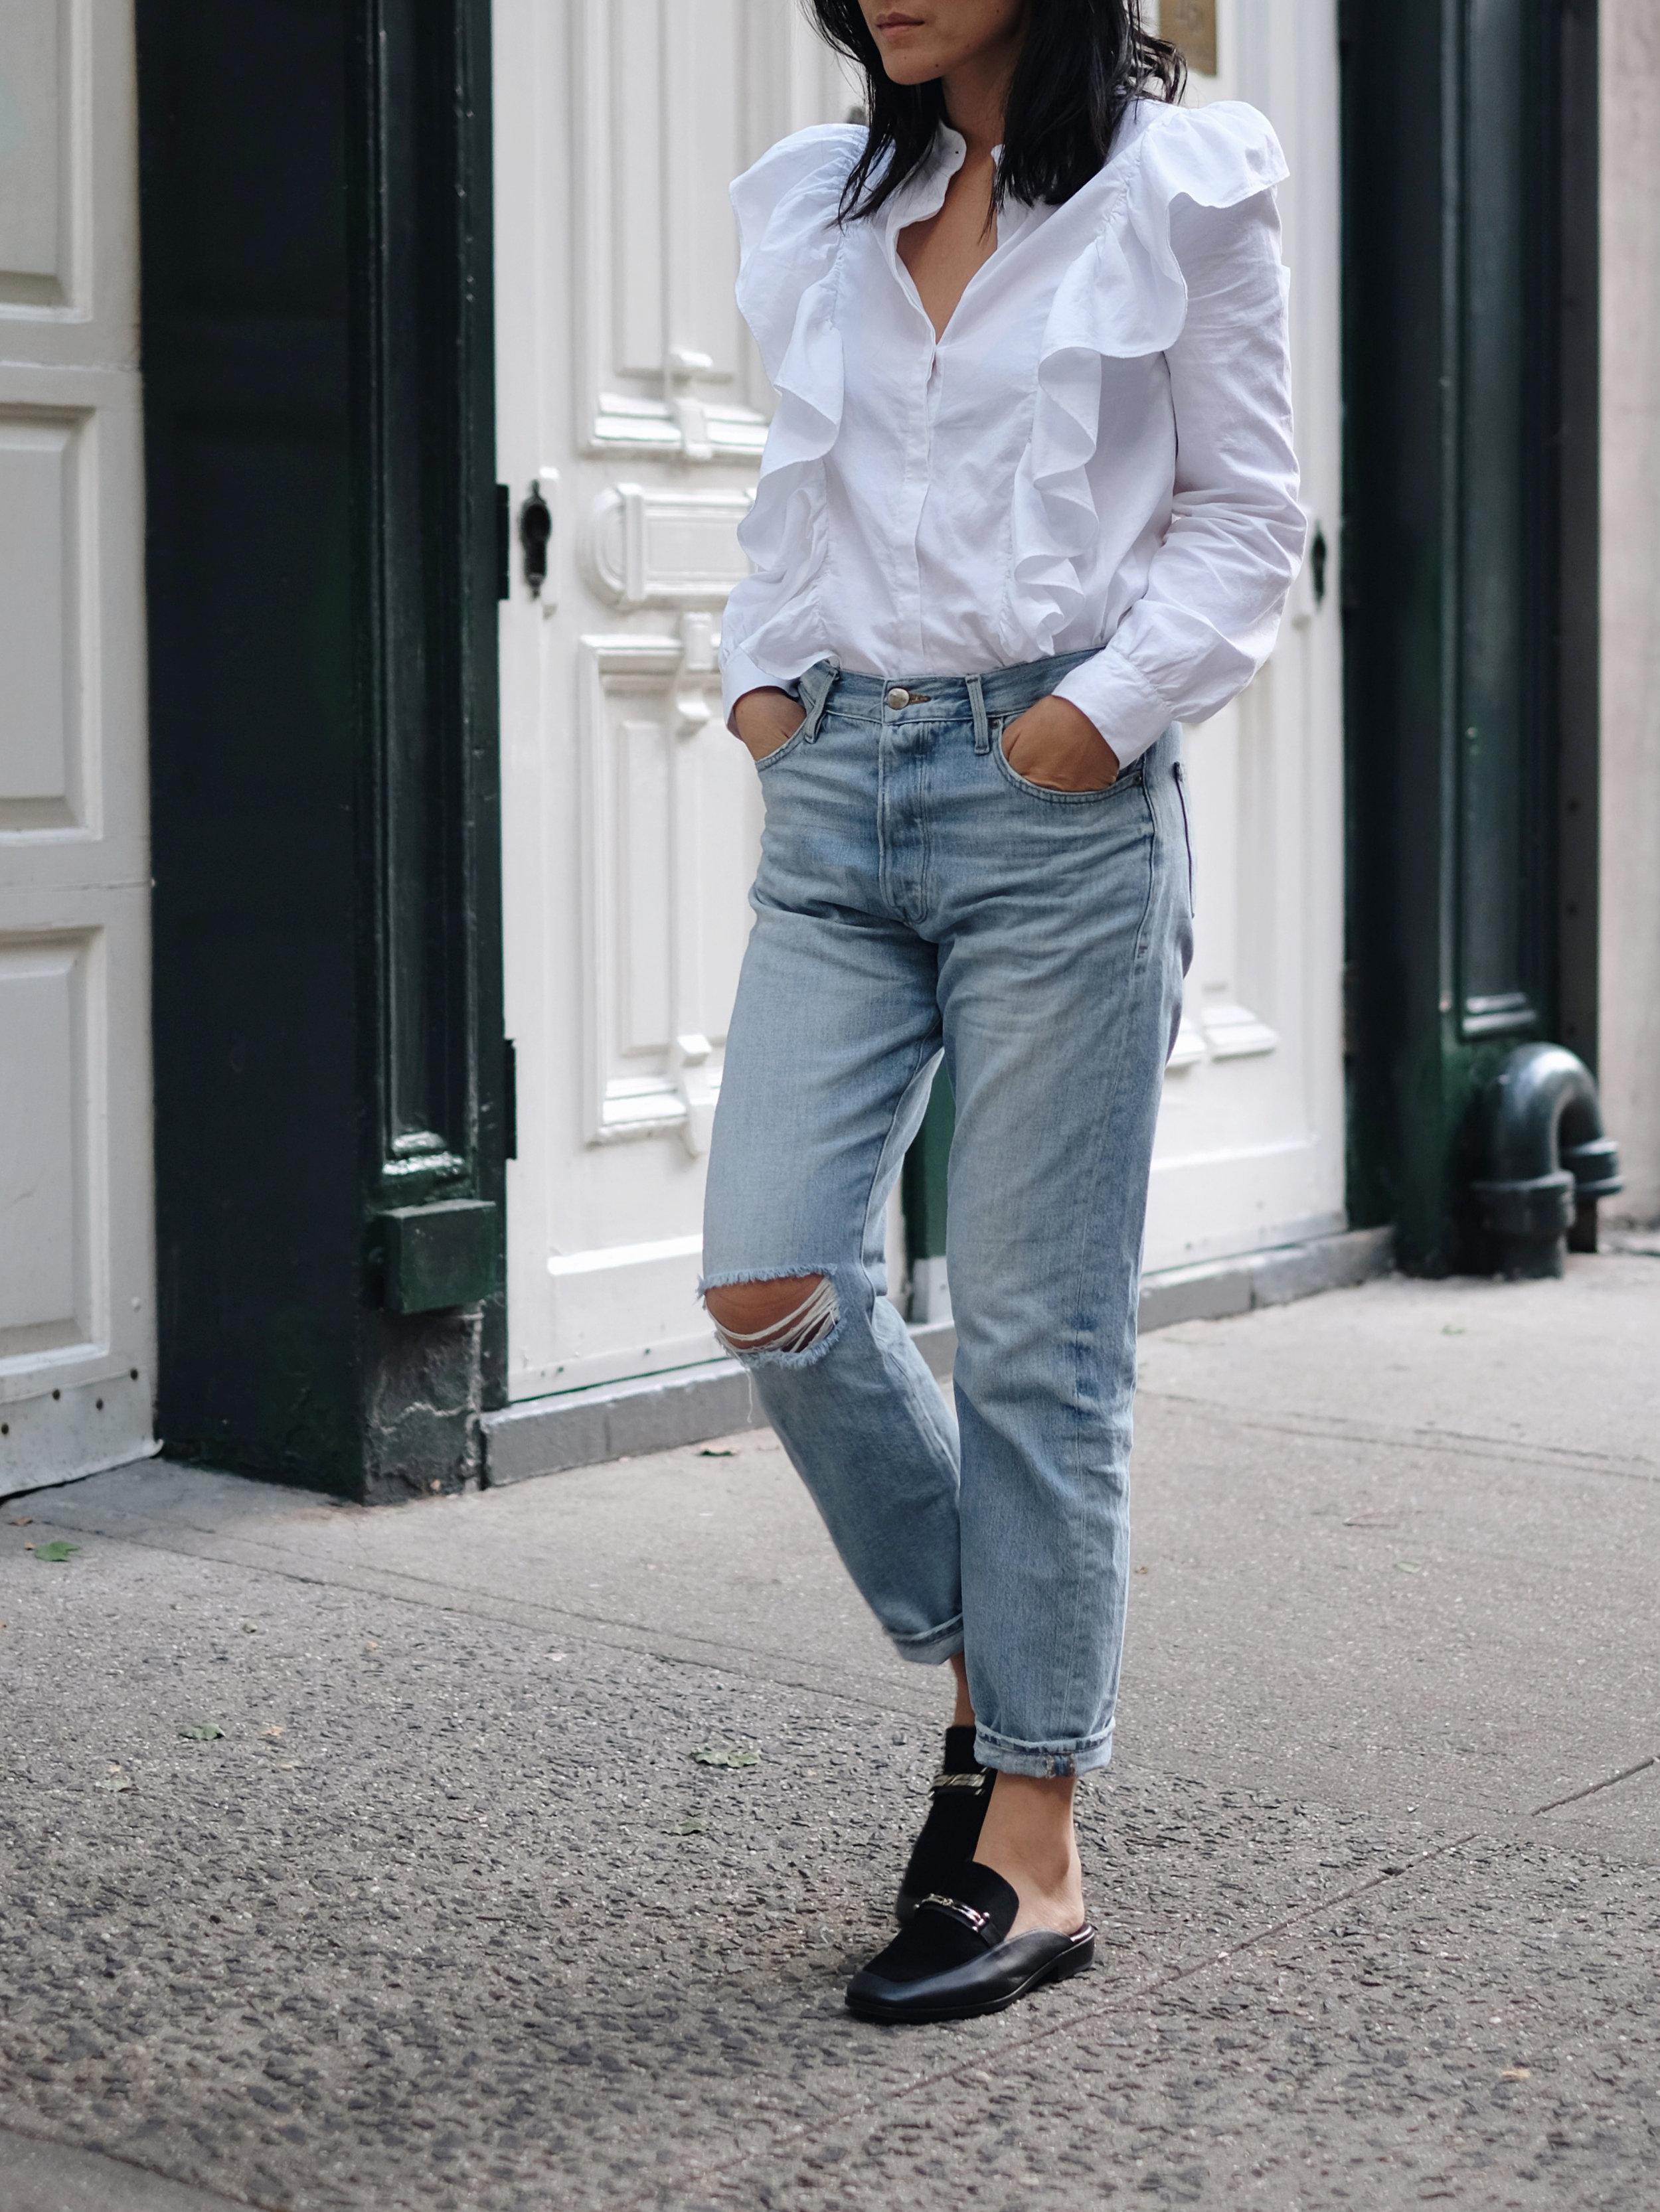 H&M   Blouse  / FRAME DENIM  Jeans /CHANEL   Bag  / NEWBARK   Mules